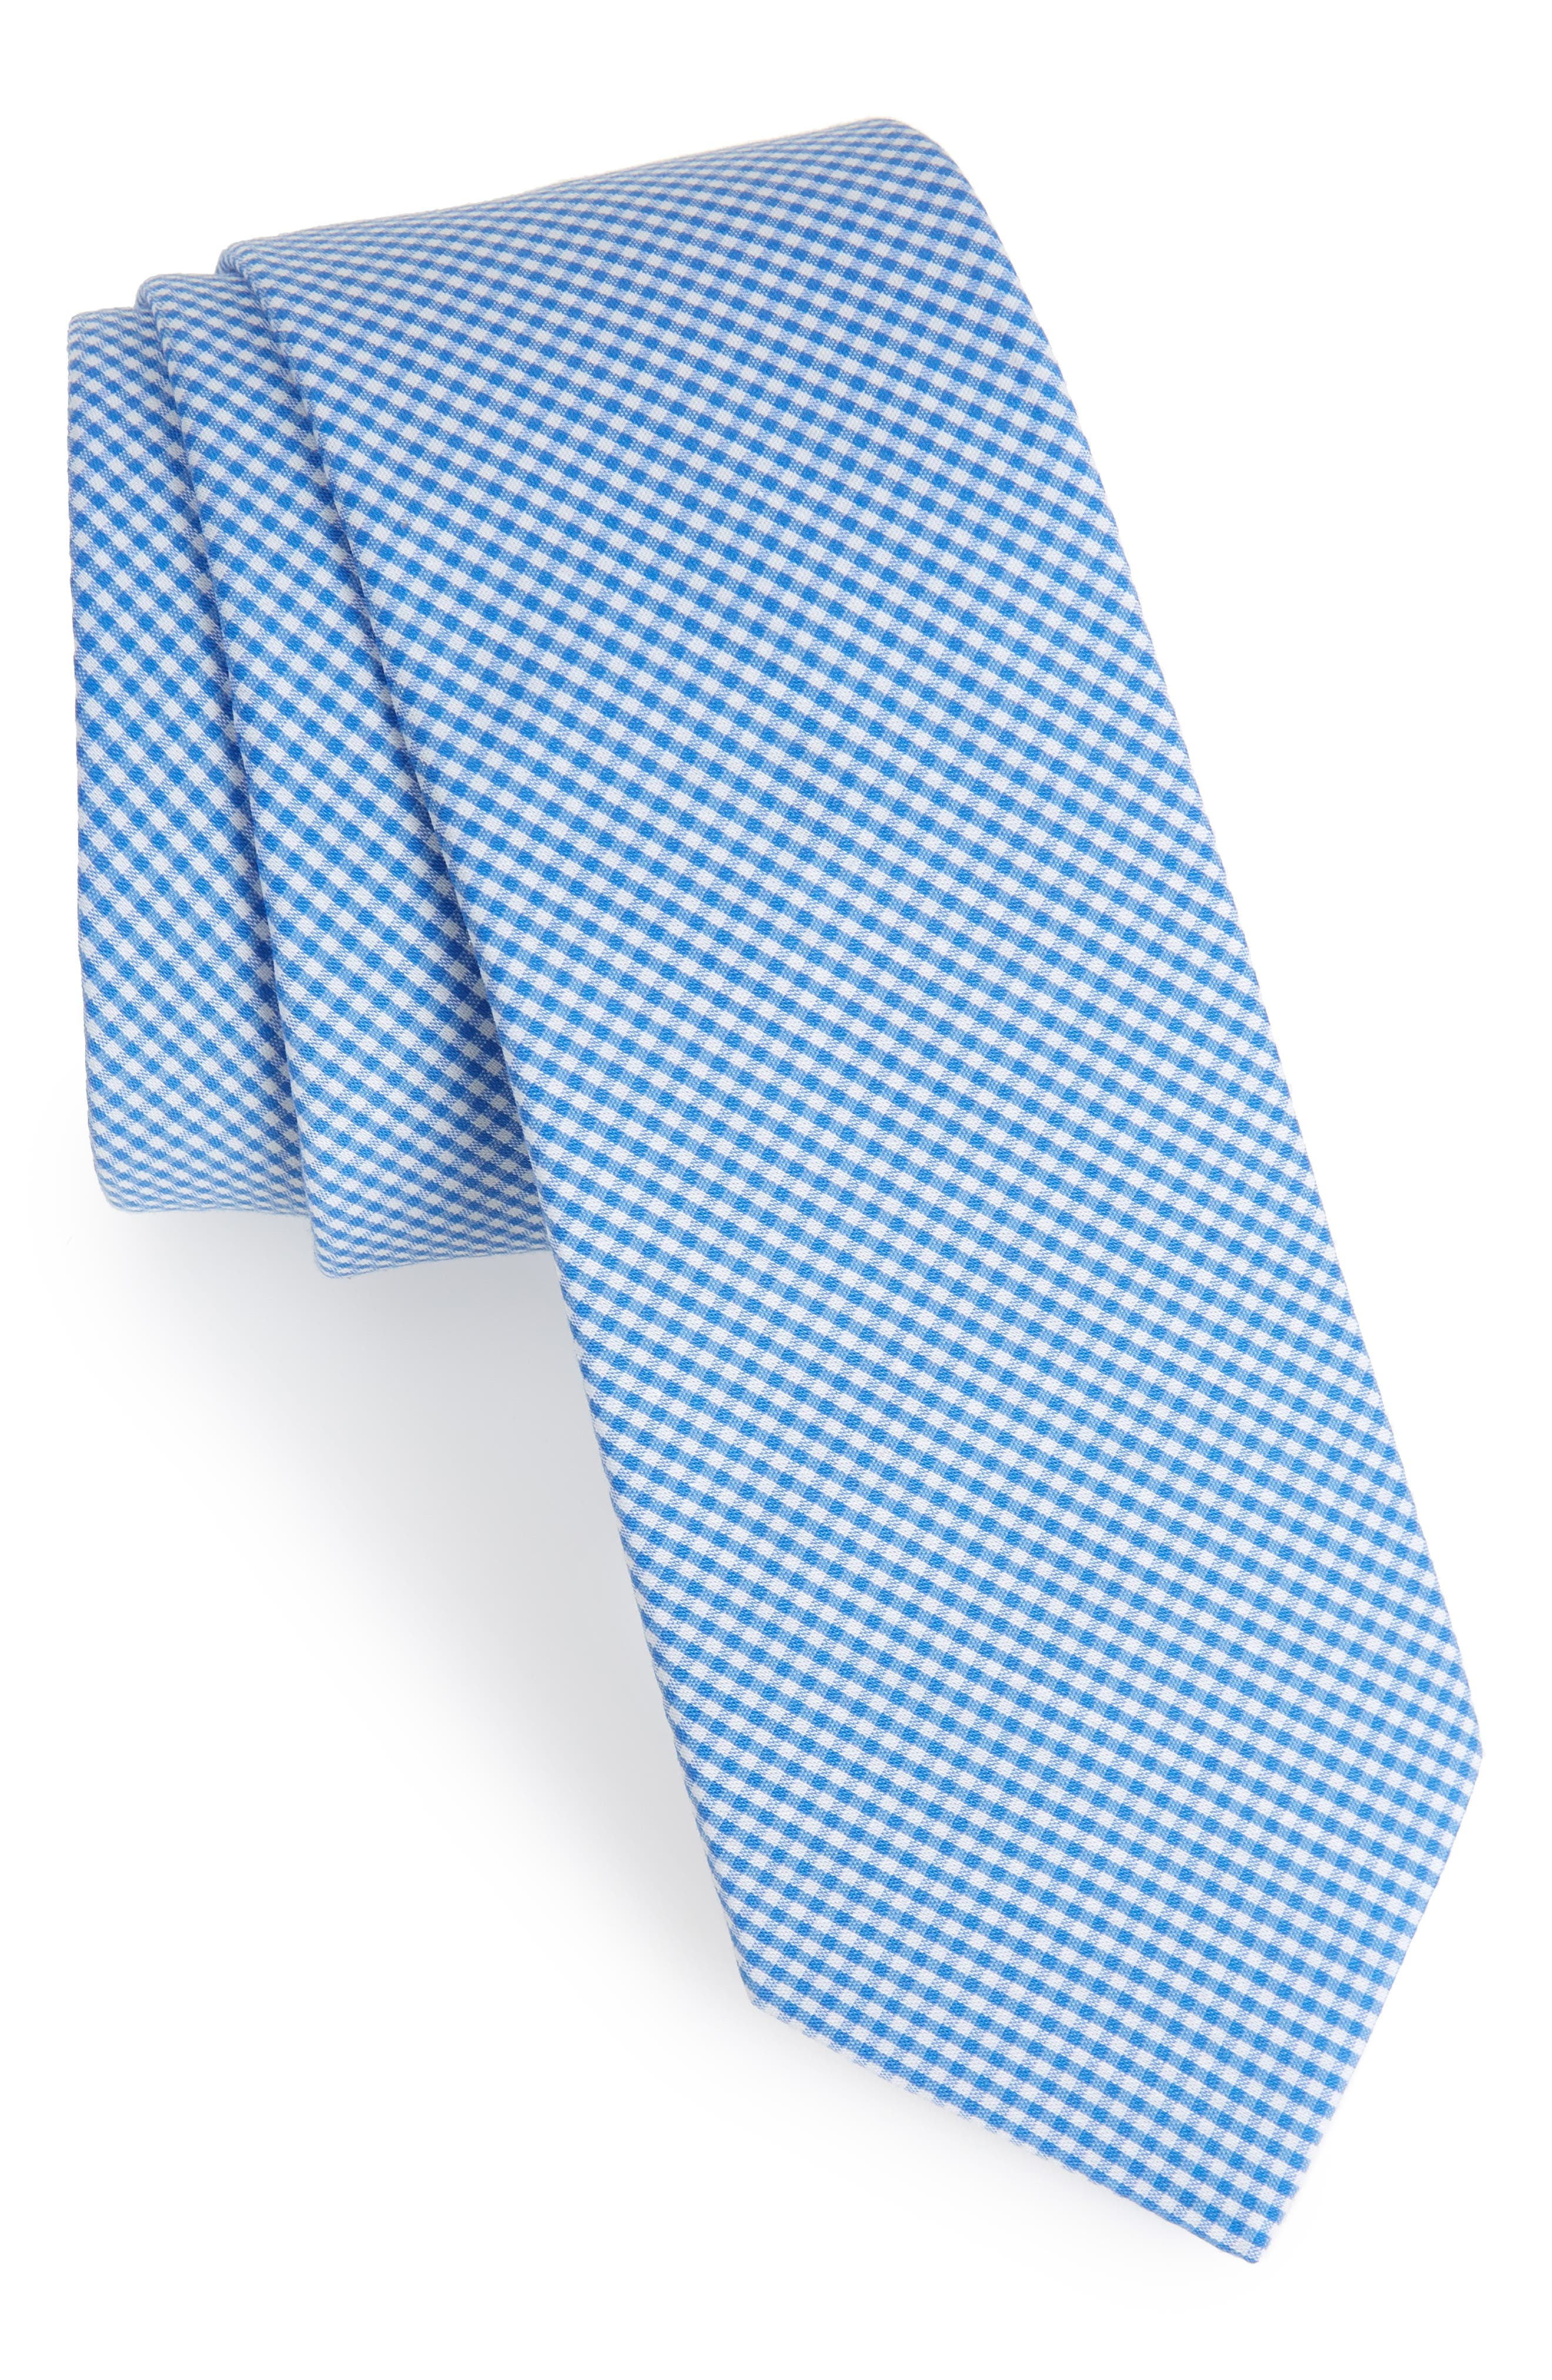 Sydney Check Cotton Skinny Tie,                             Main thumbnail 2, color,